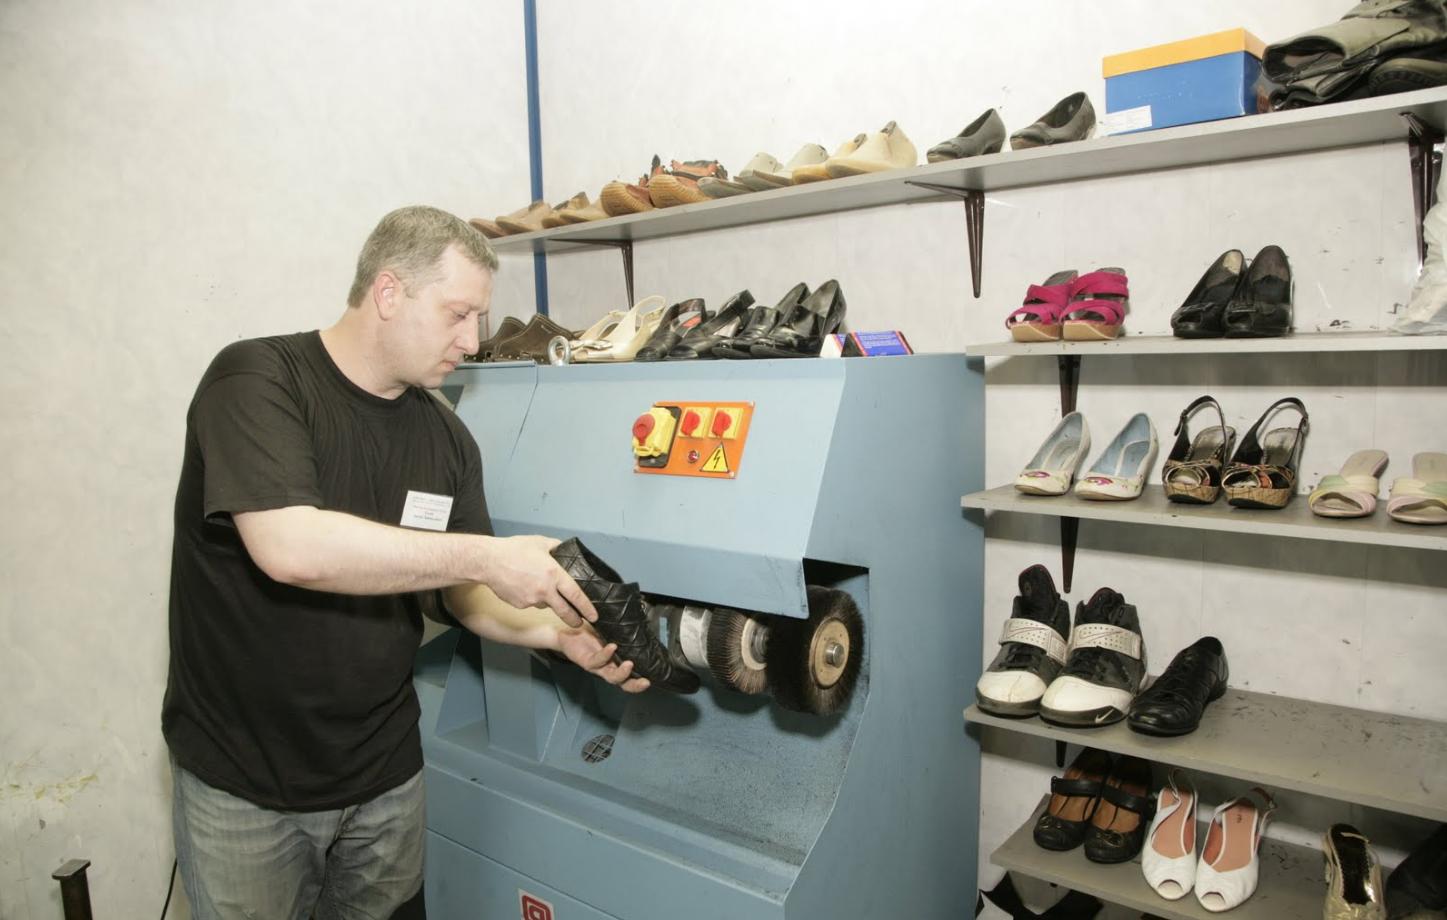 biznes-s-nebolshimi-dengami-remont-obuvi